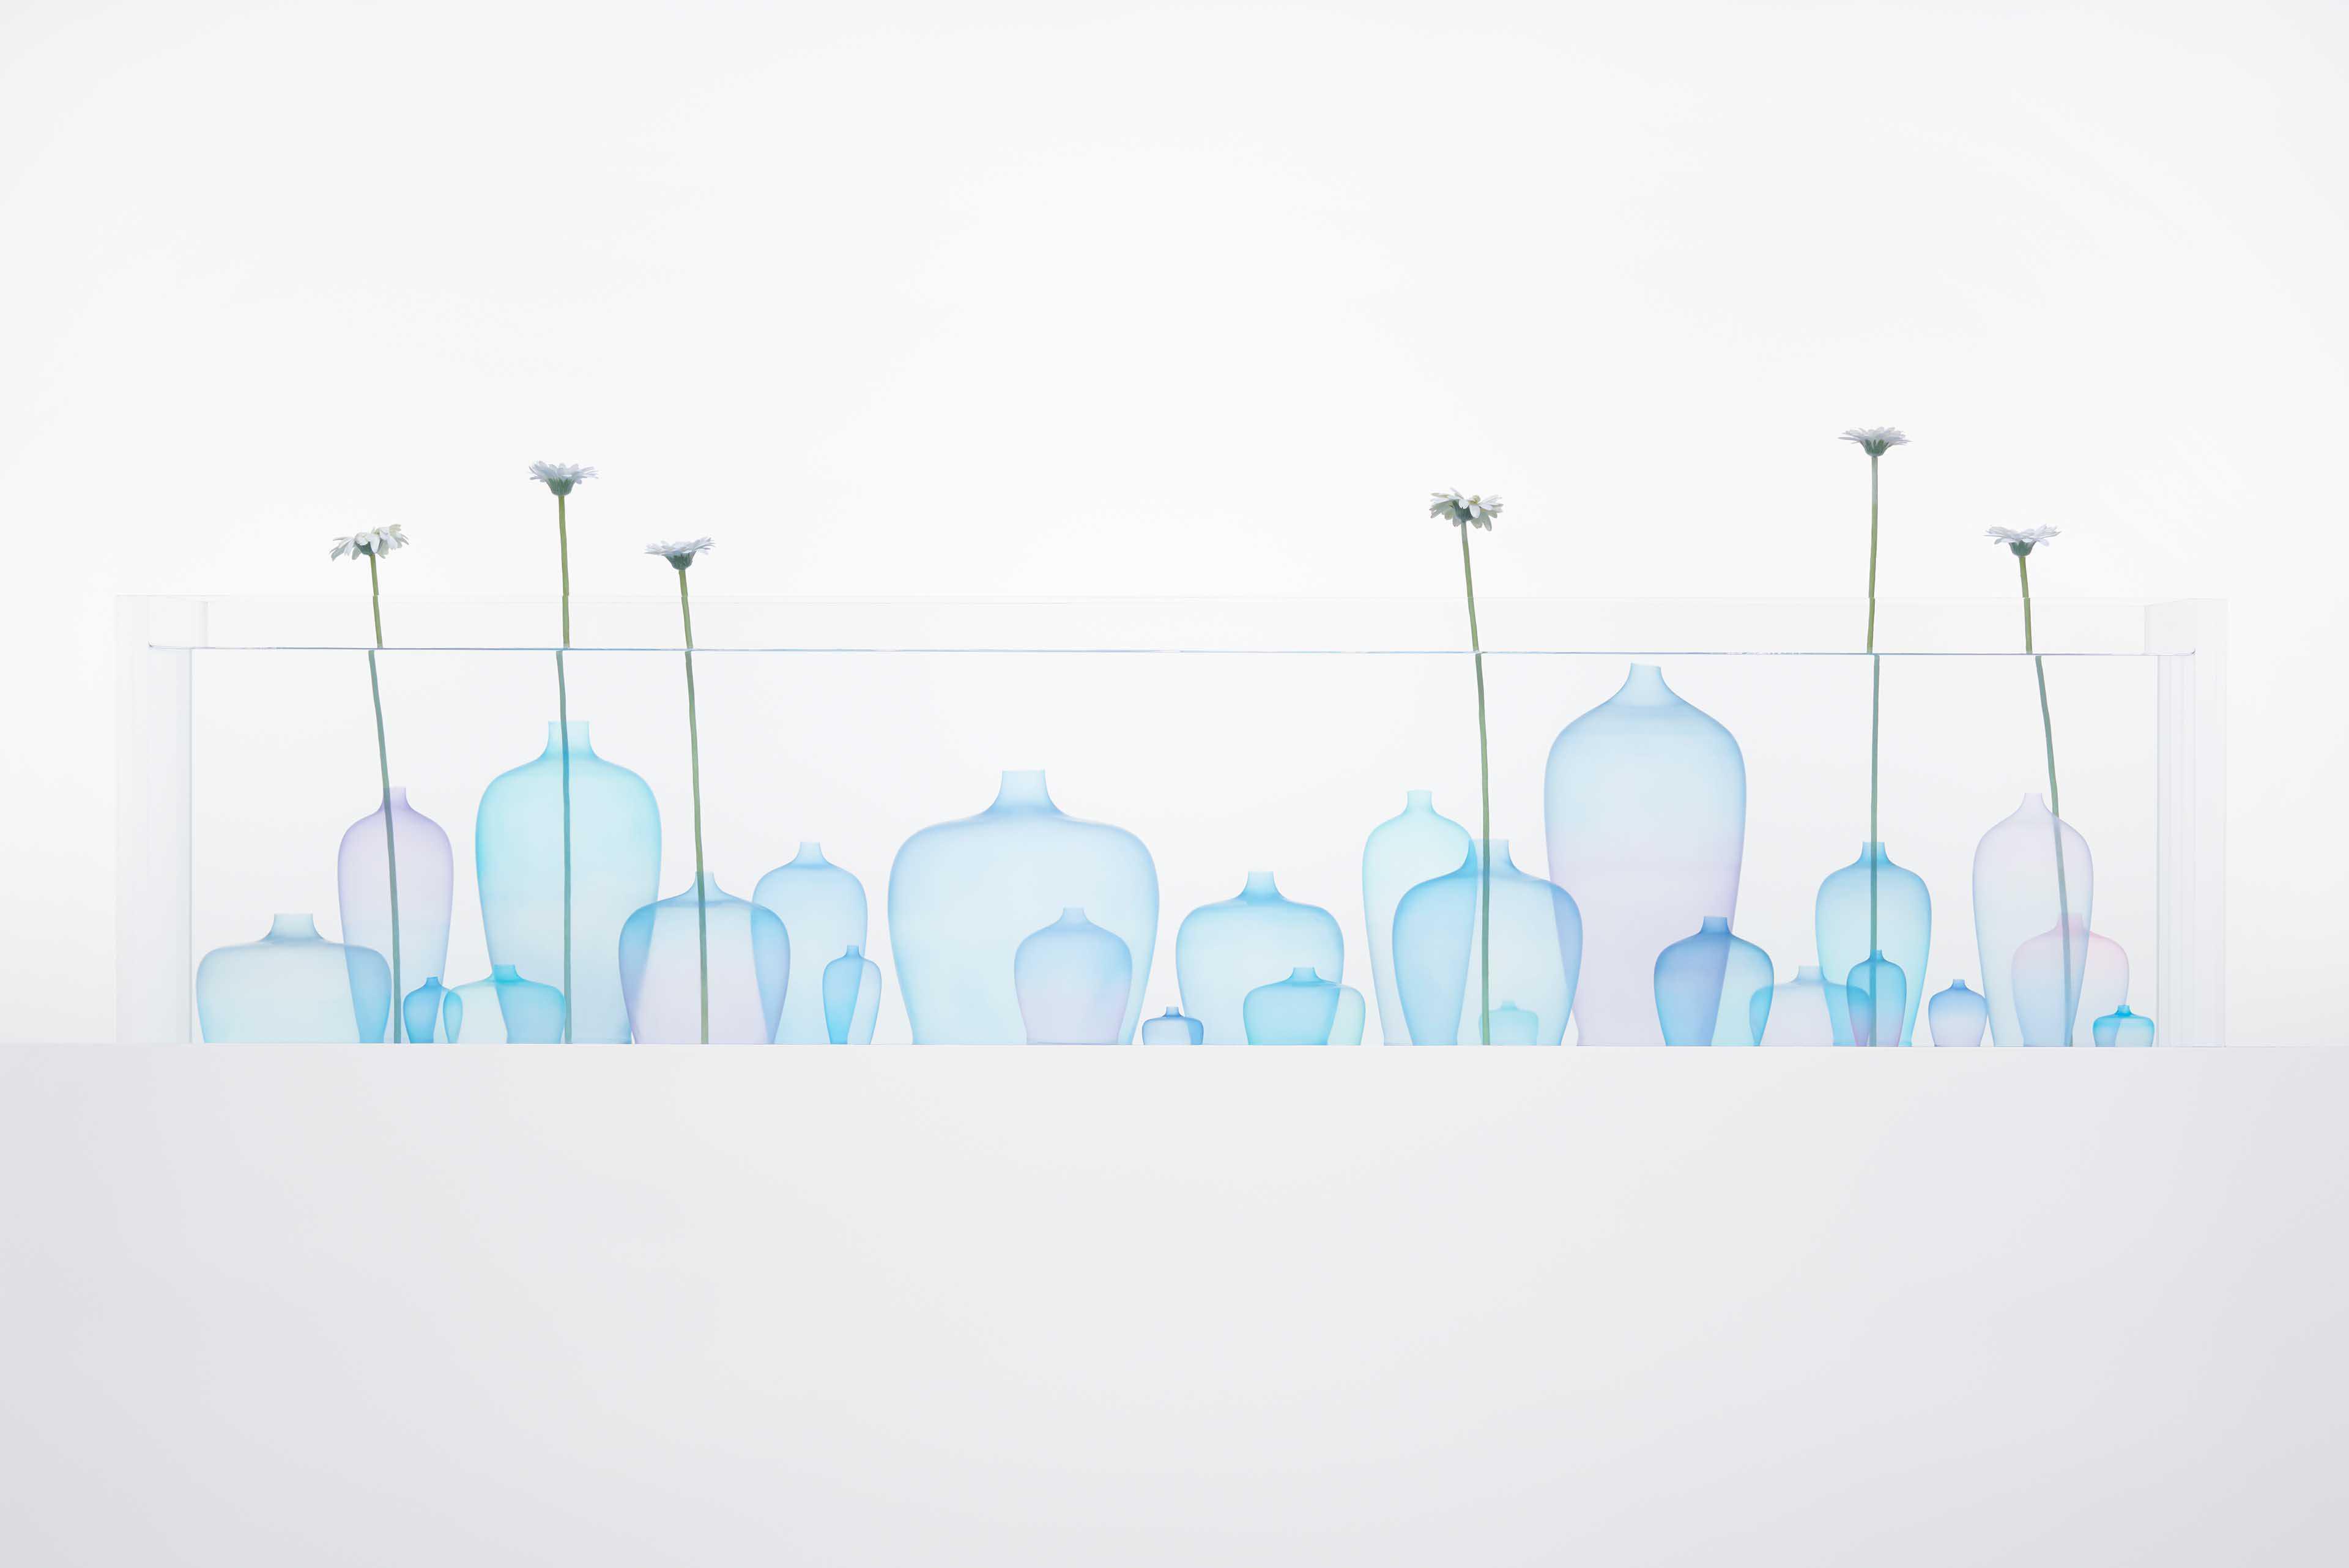 Nendo: Jellyfish Vase  - 1 jellyfish vase10 akihiro yoshida 39